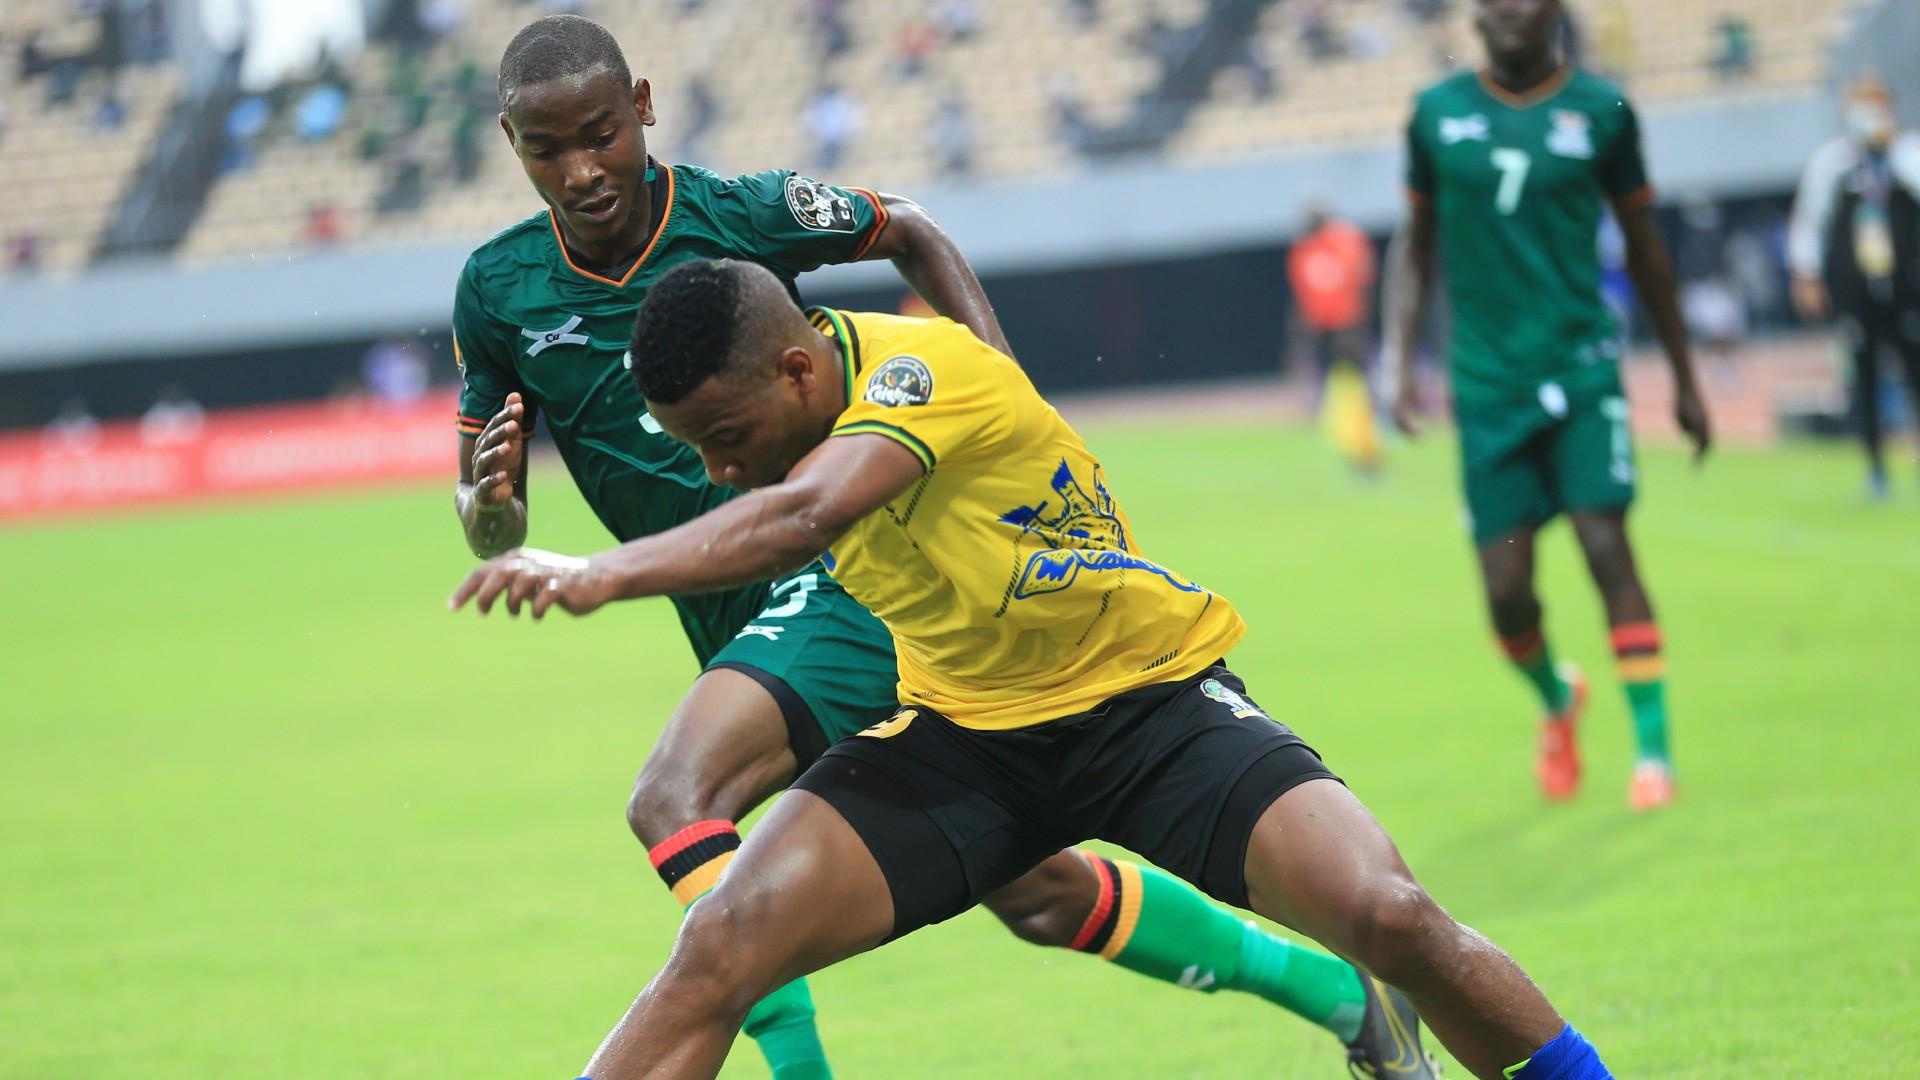 Chan 2021: Musakanya ruled out of Zambia vs Morocco clash